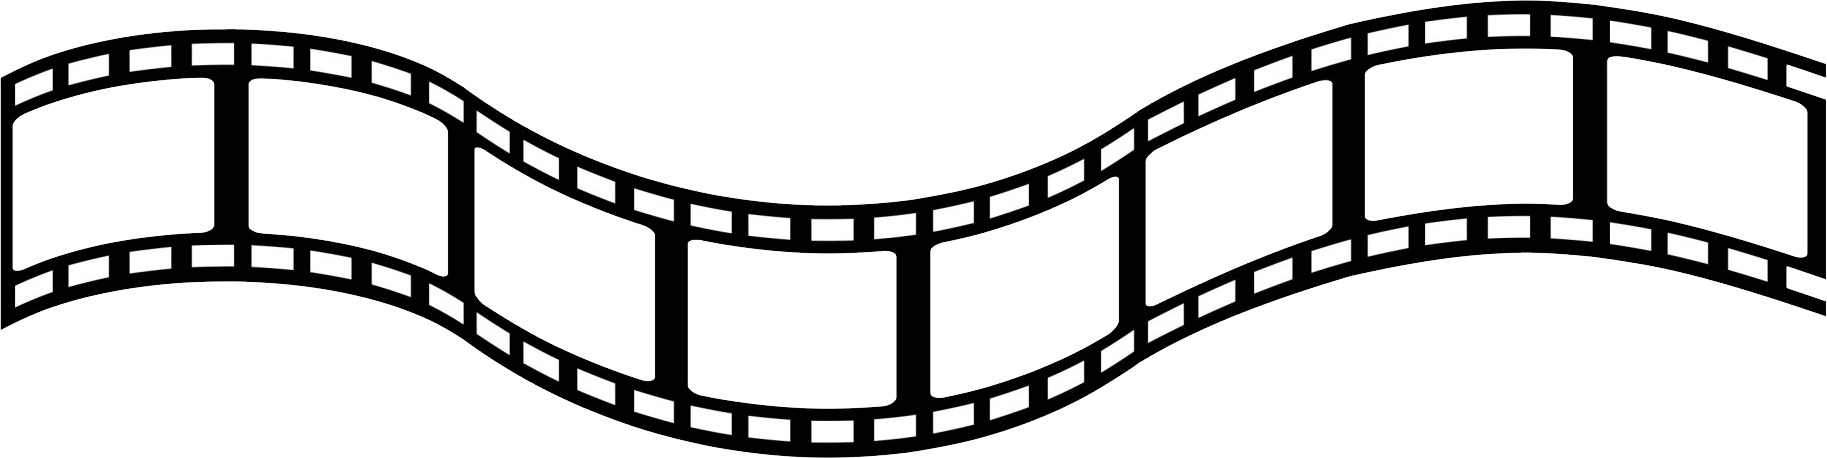 Download Film Reel Clipart Transparent - Full Size PNG ...